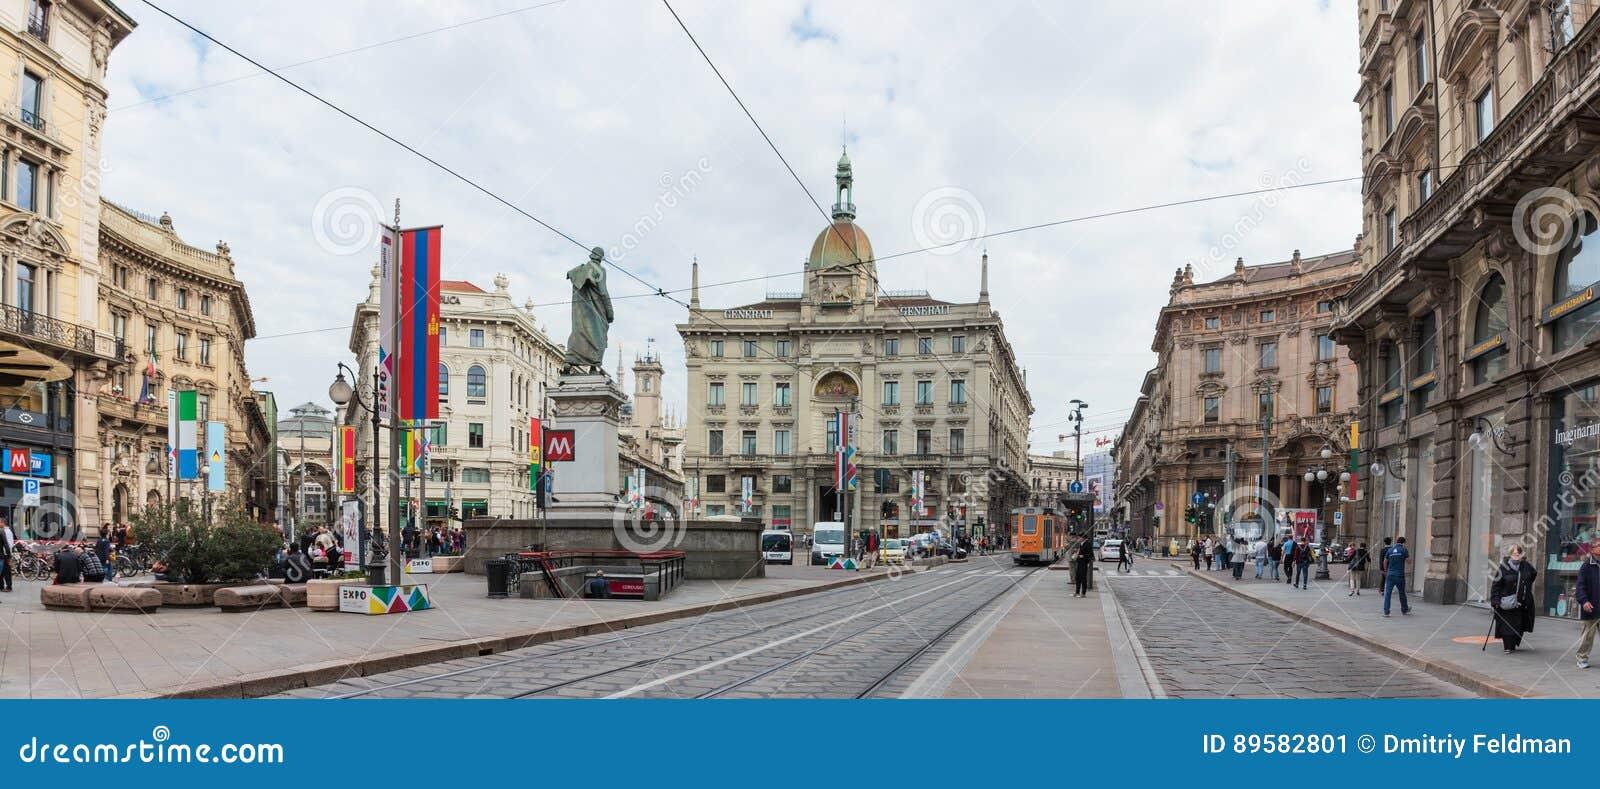 Люди в украшенном бульваре Dante и аркада Cordusio в милане